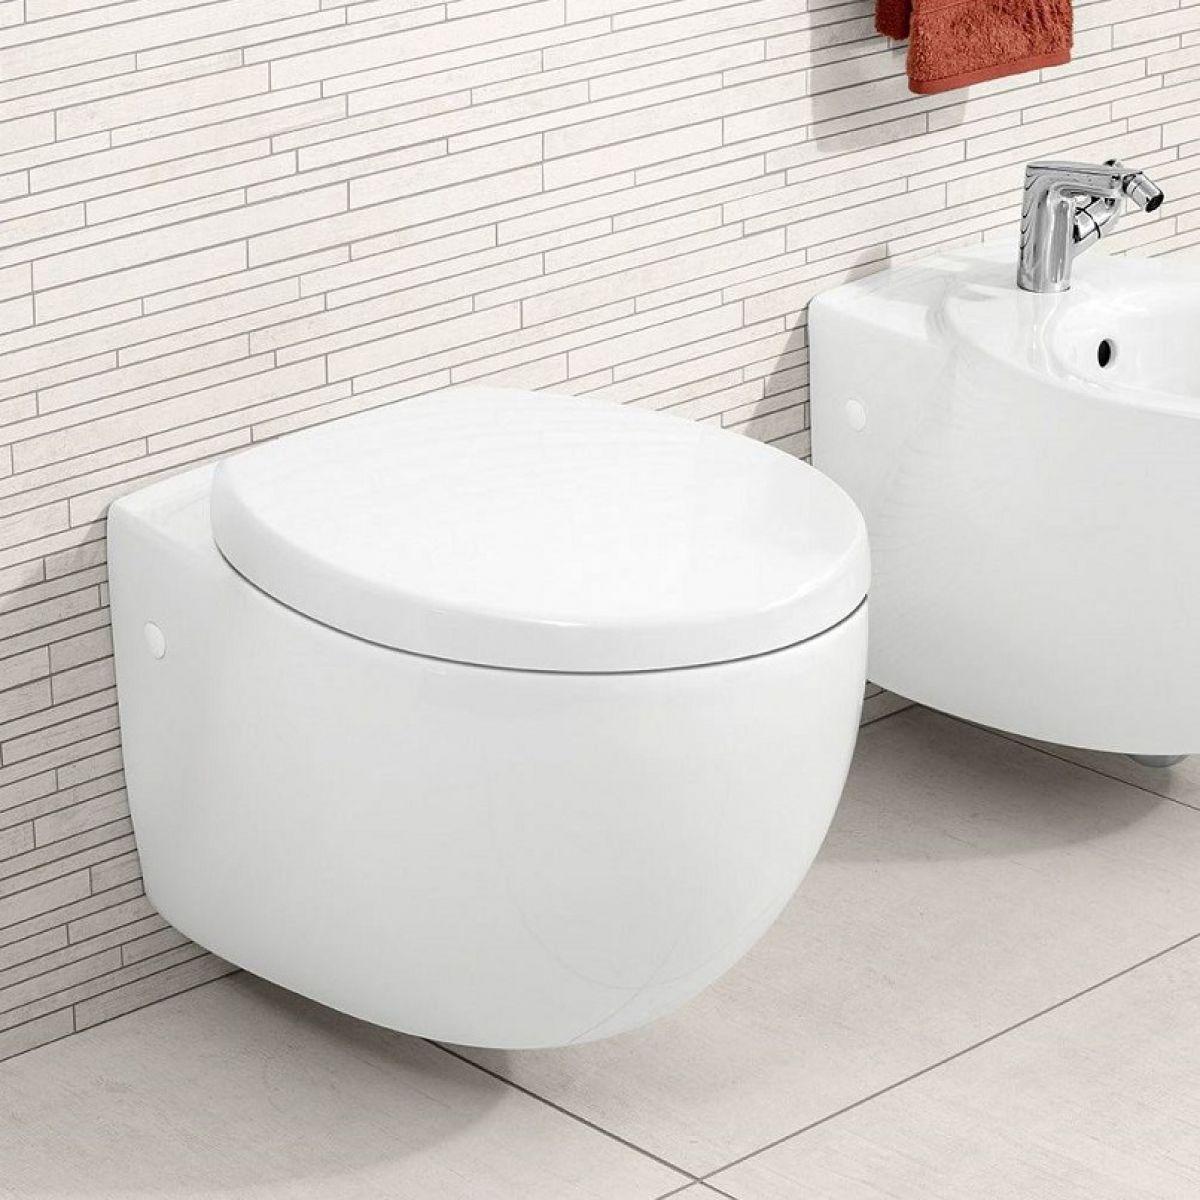 Villeroy Boch Aveo New Generation Wall Mounted Toilet Wall Hung Toilet Wall Mounted Toilet Luxury Toilet